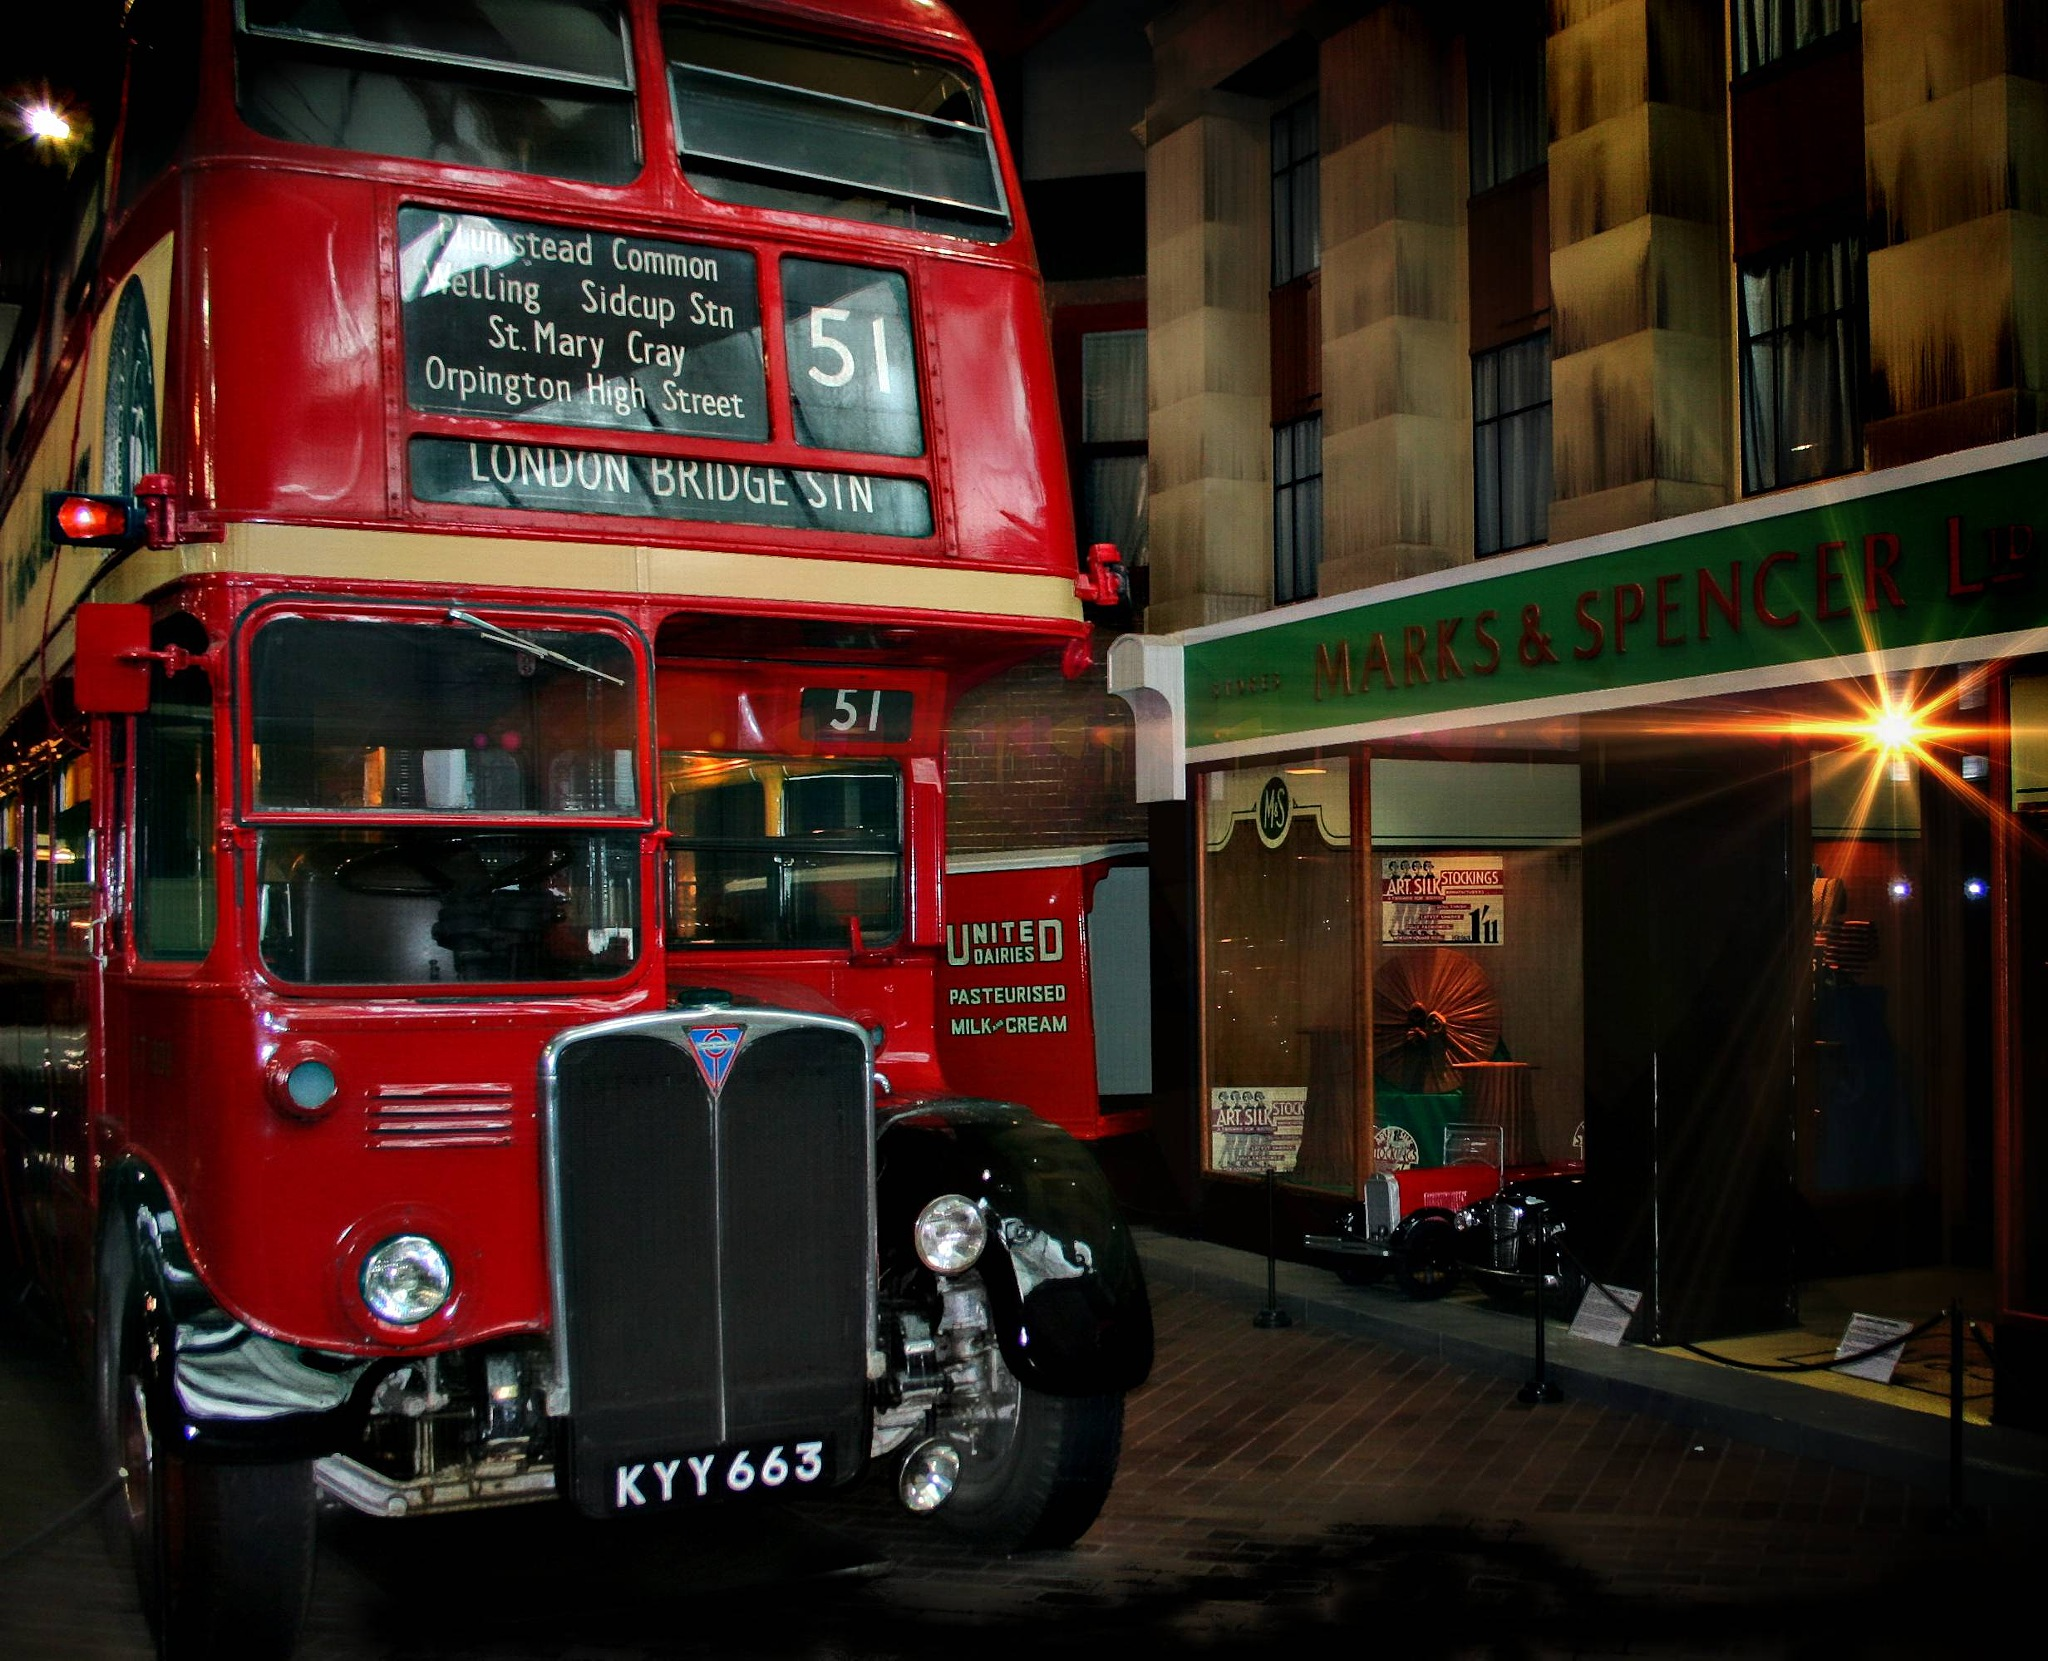 classic london bus by Paul Gast